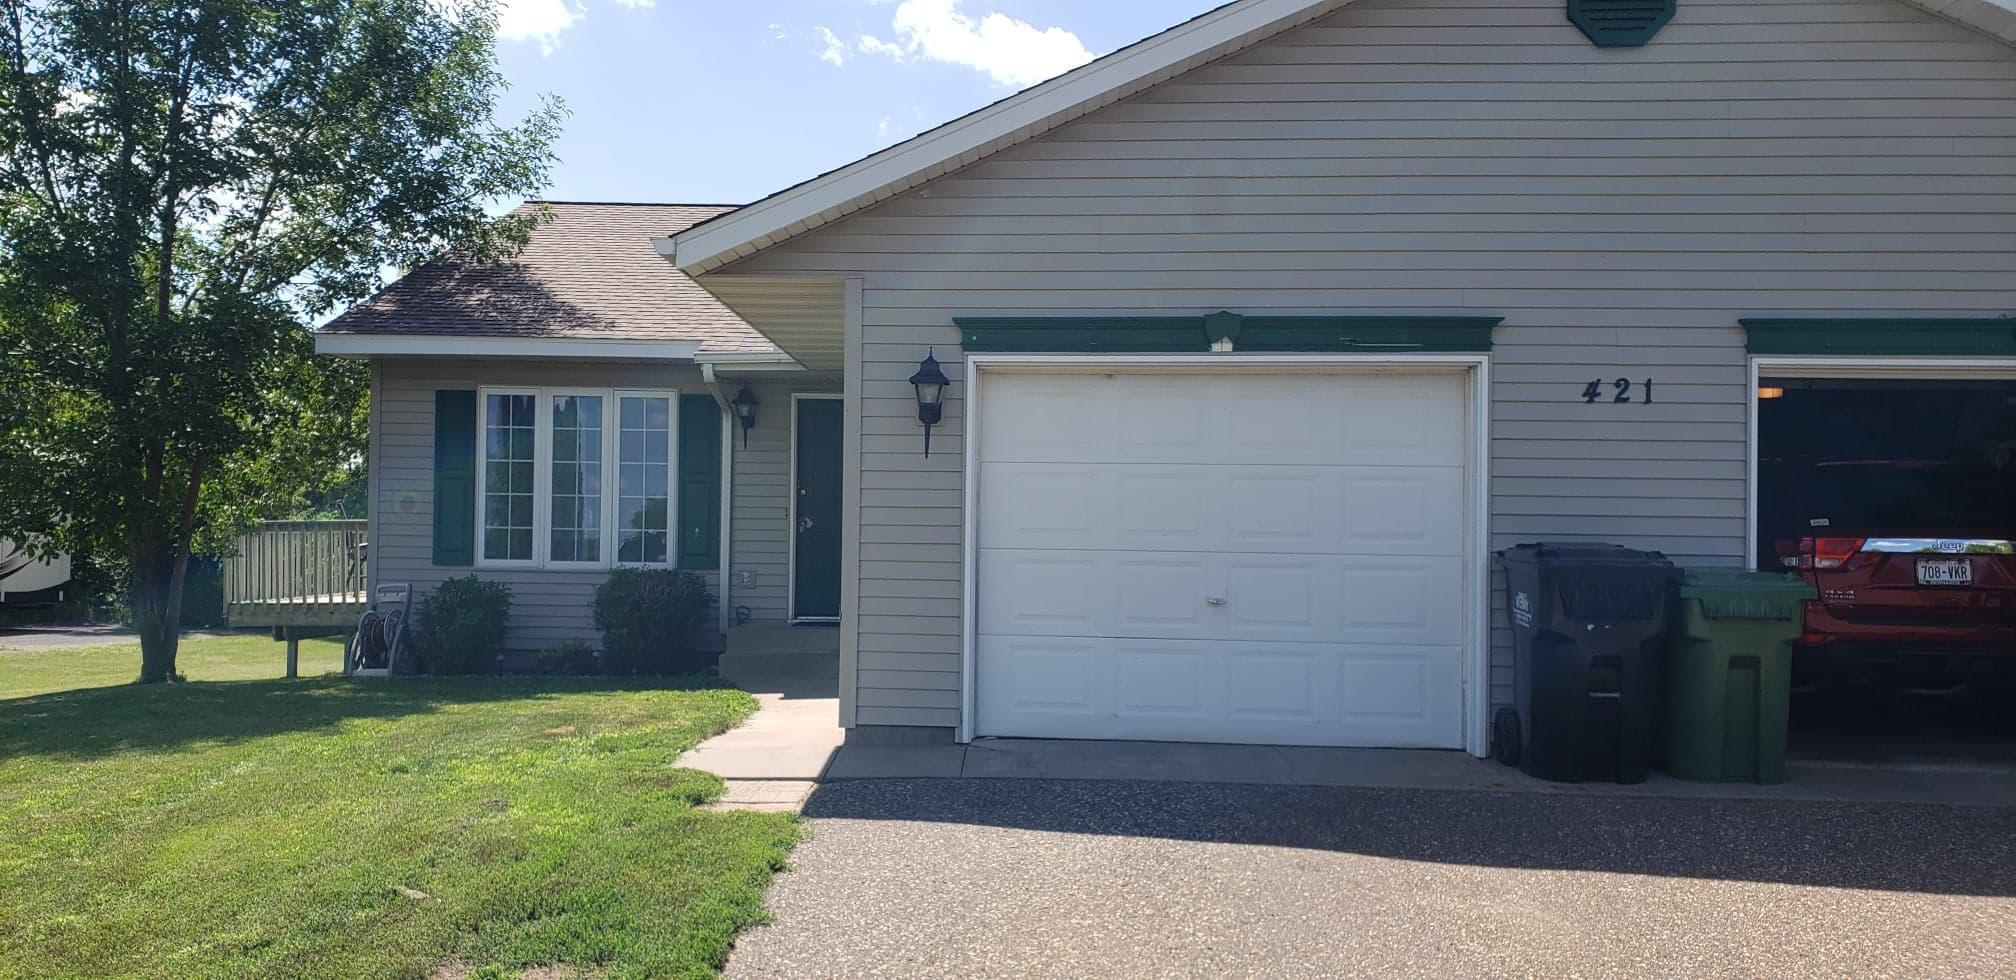 421 Aaron Street Property Photo - Star Prairie, WI real estate listing